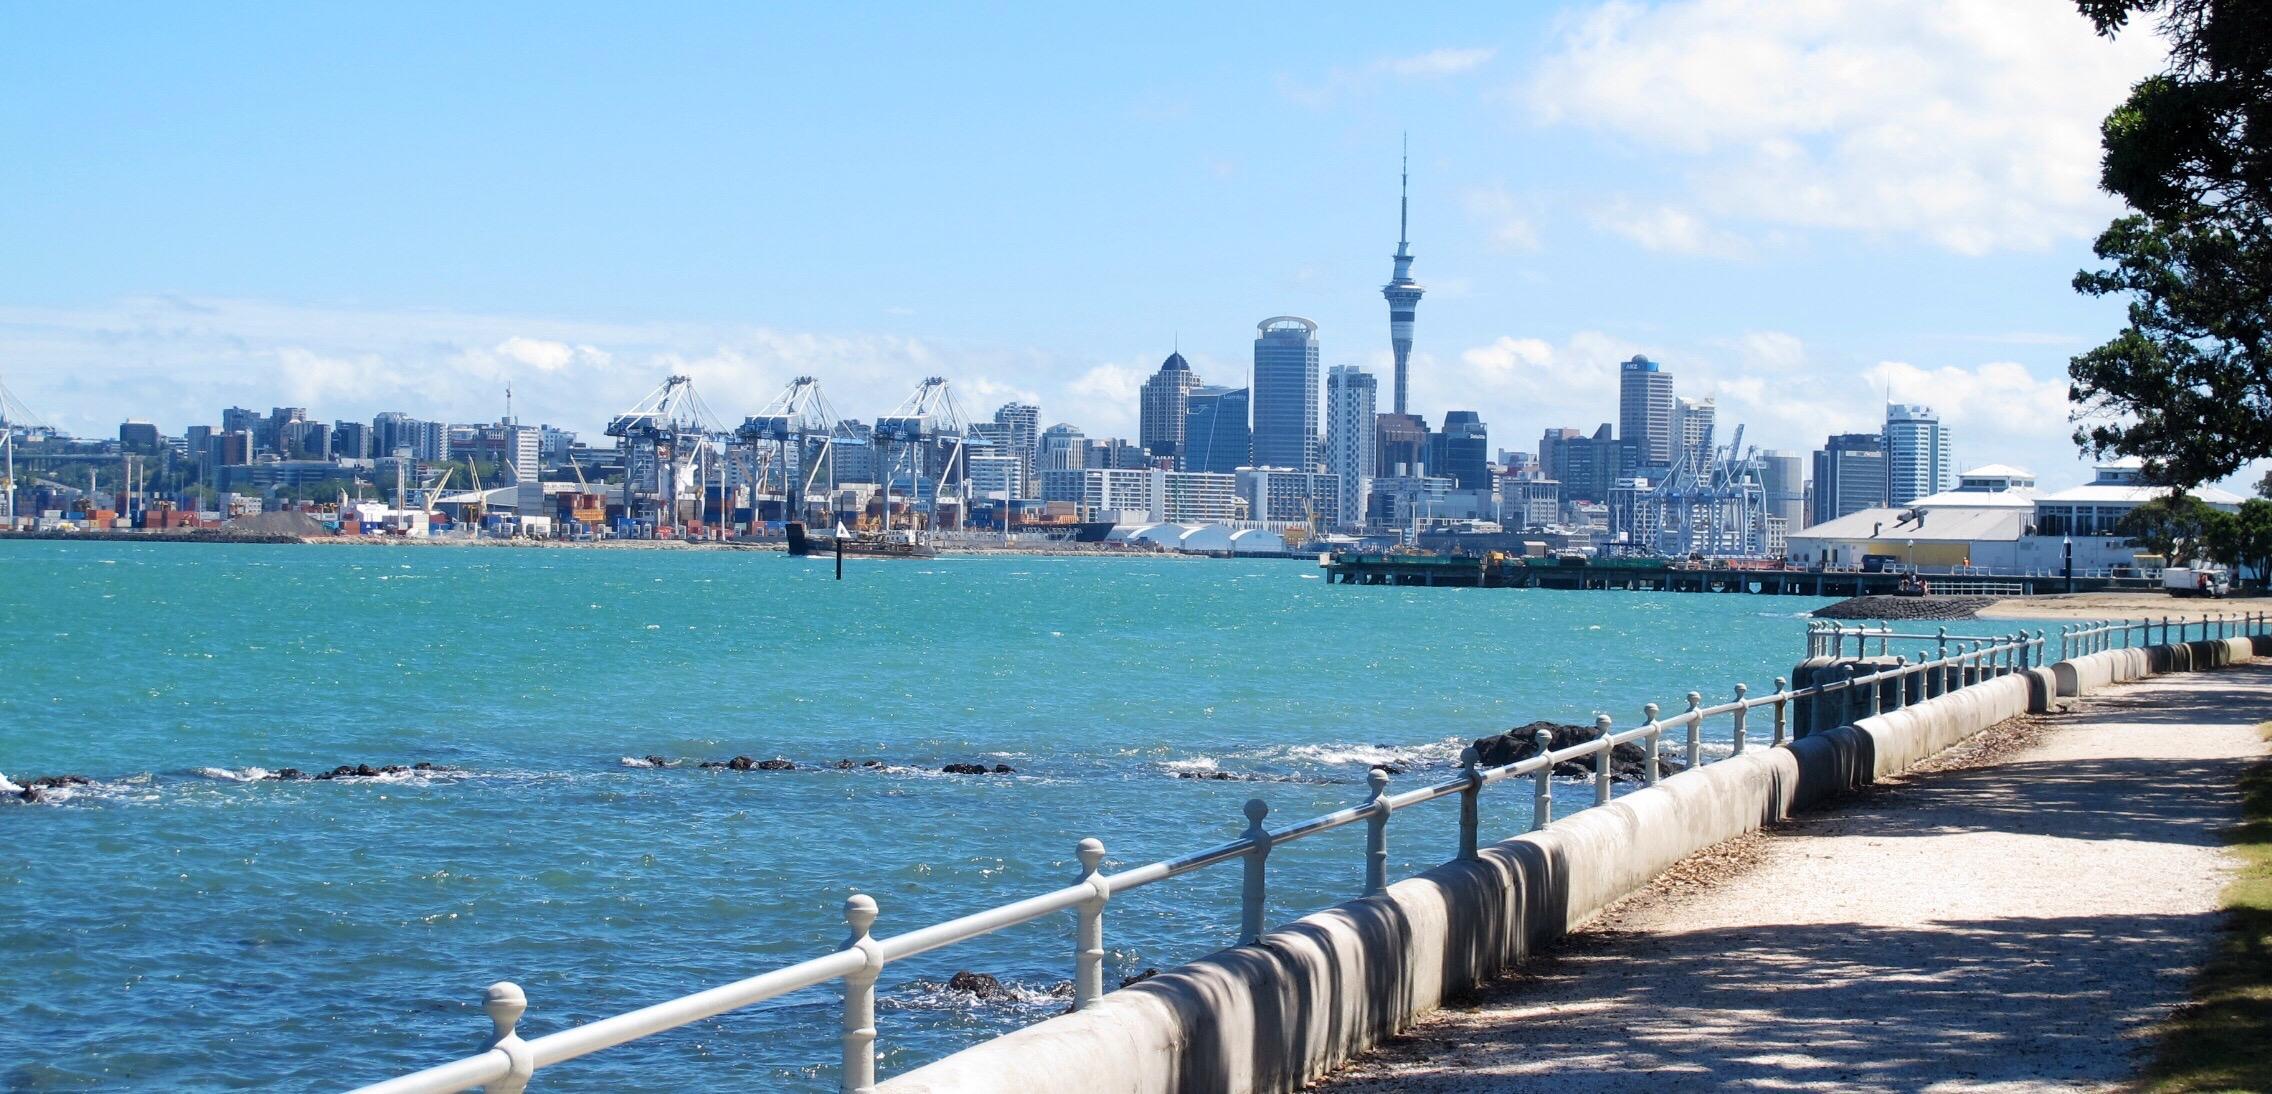 new zealand city life - photo #46